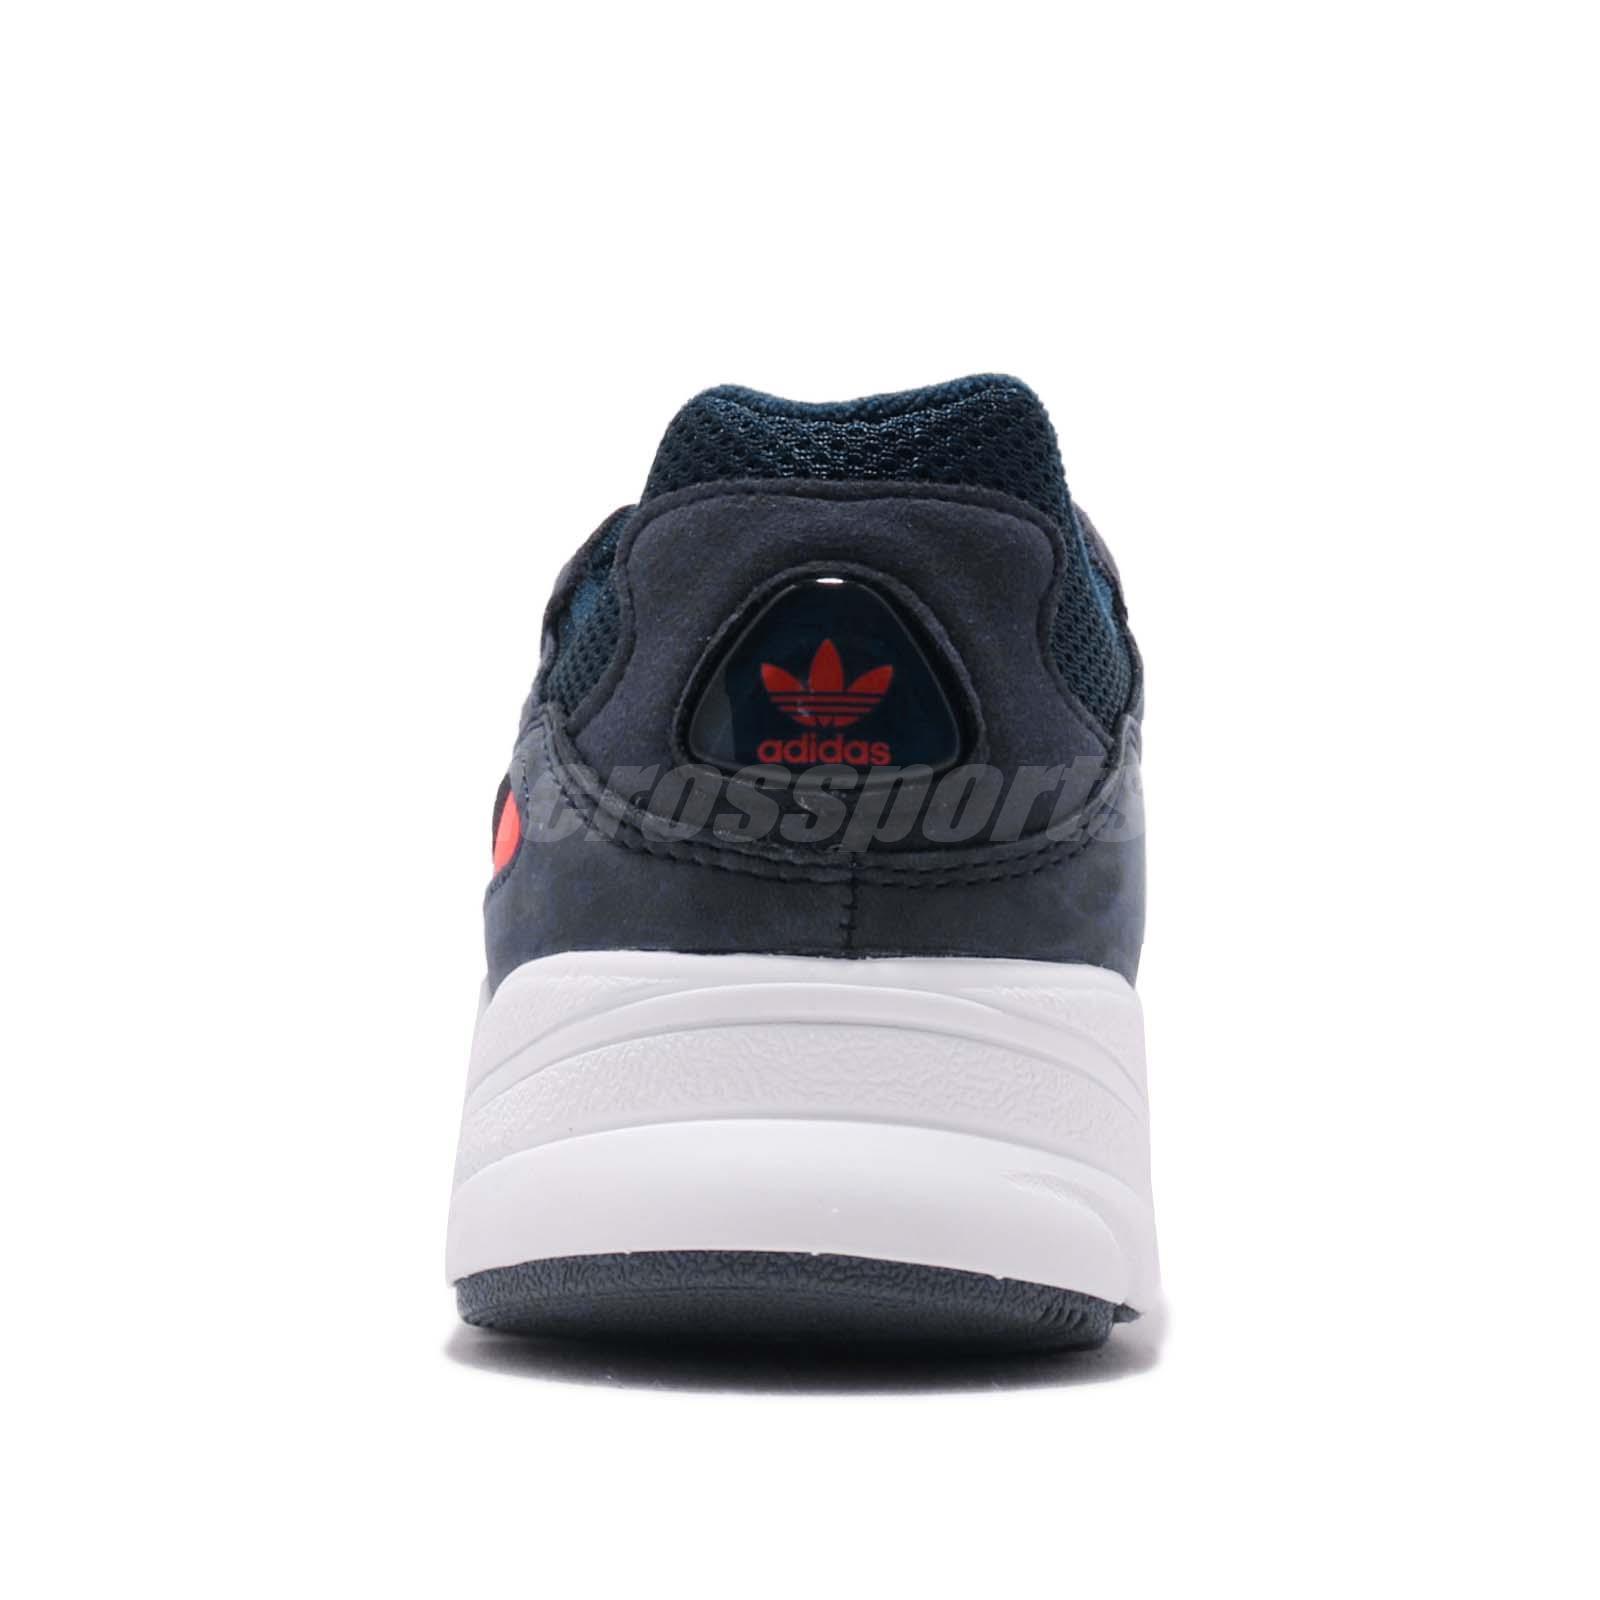 ee4b1ed46fcaf8 adidas Originals Yung-96 Navy Solar Red Mens Retro Running Shoes ...